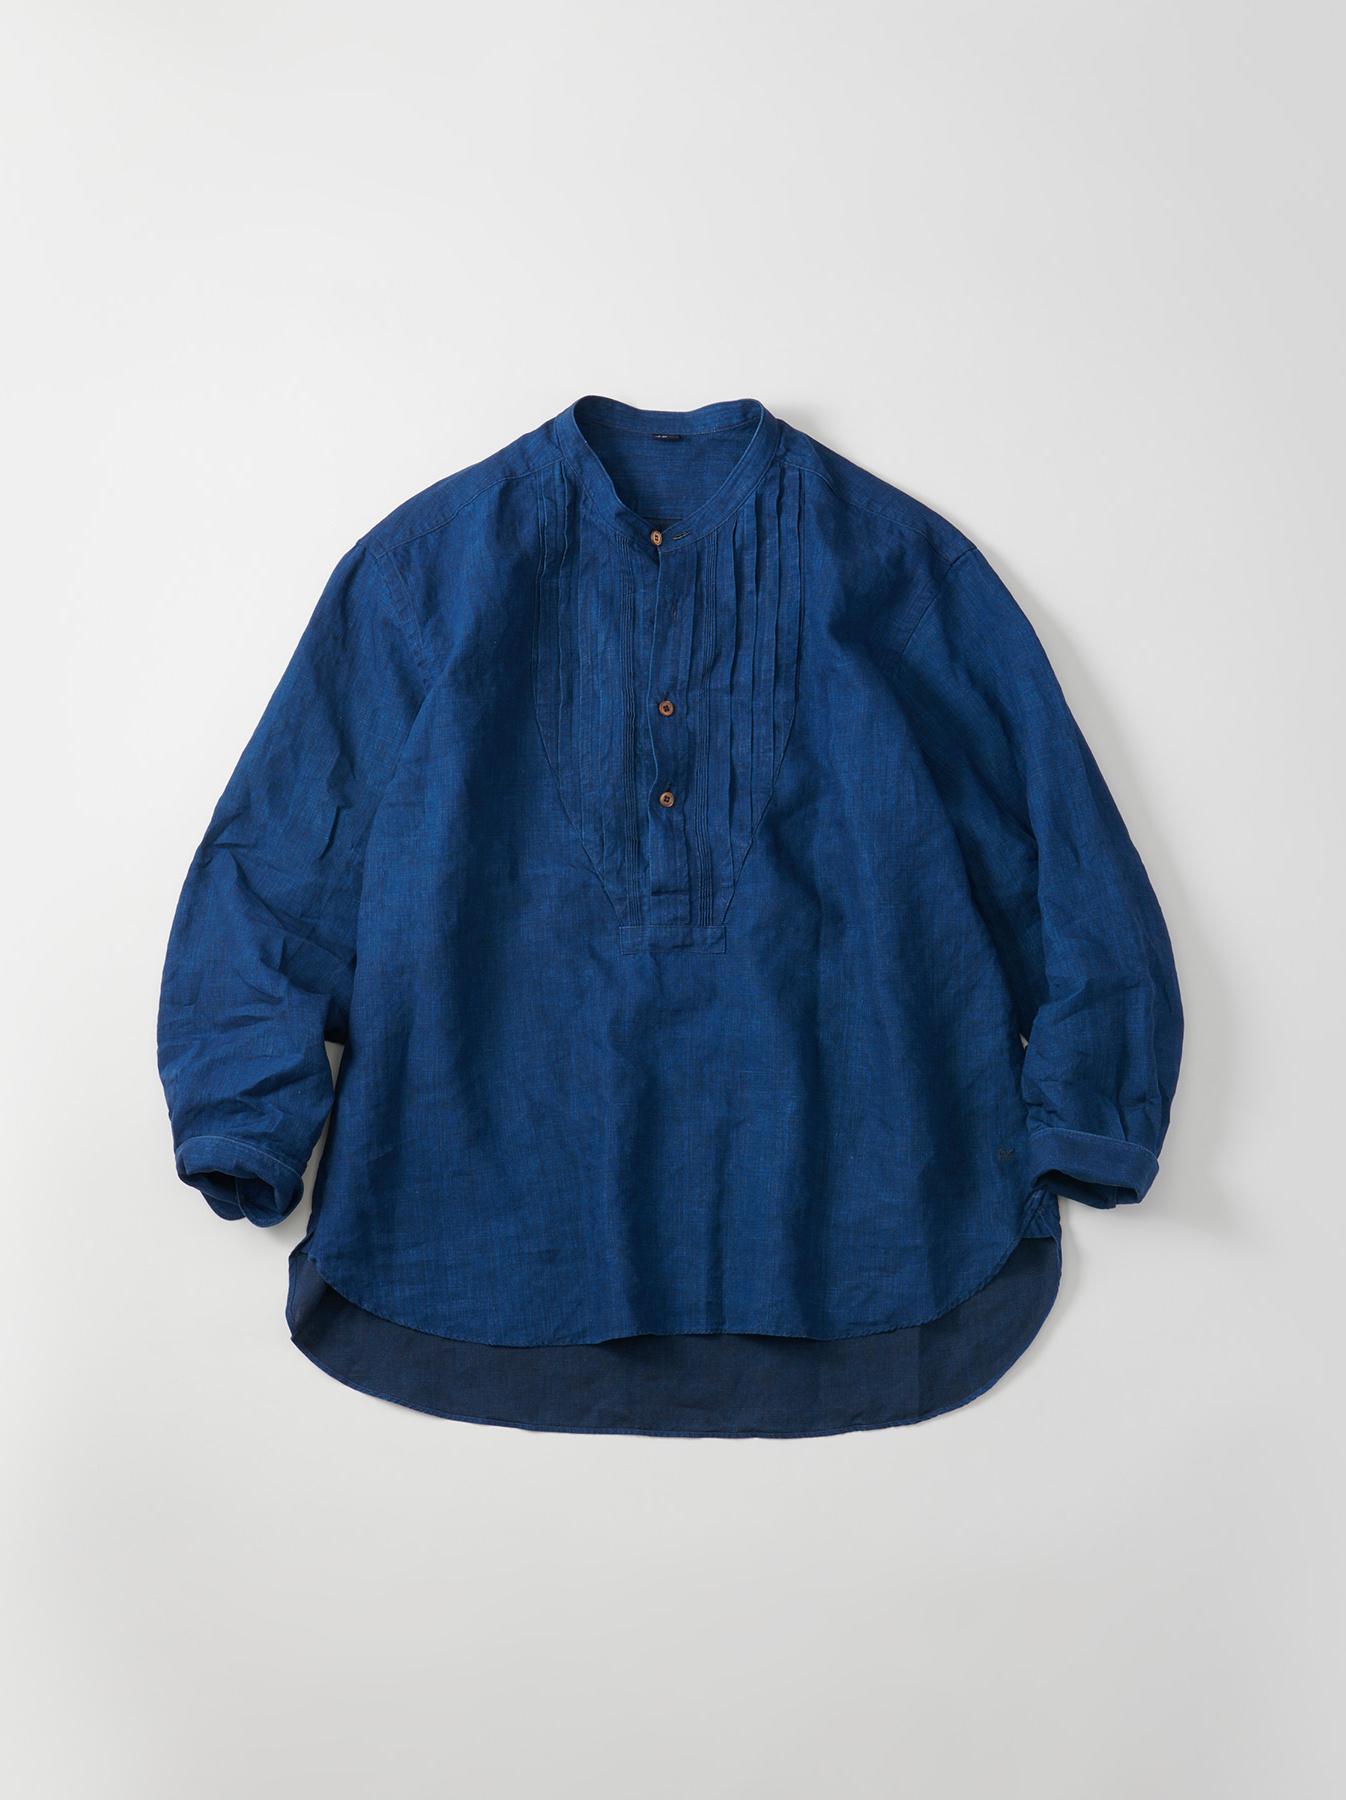 WH Indigo Linen Pin-tuck 908 Shirt-1